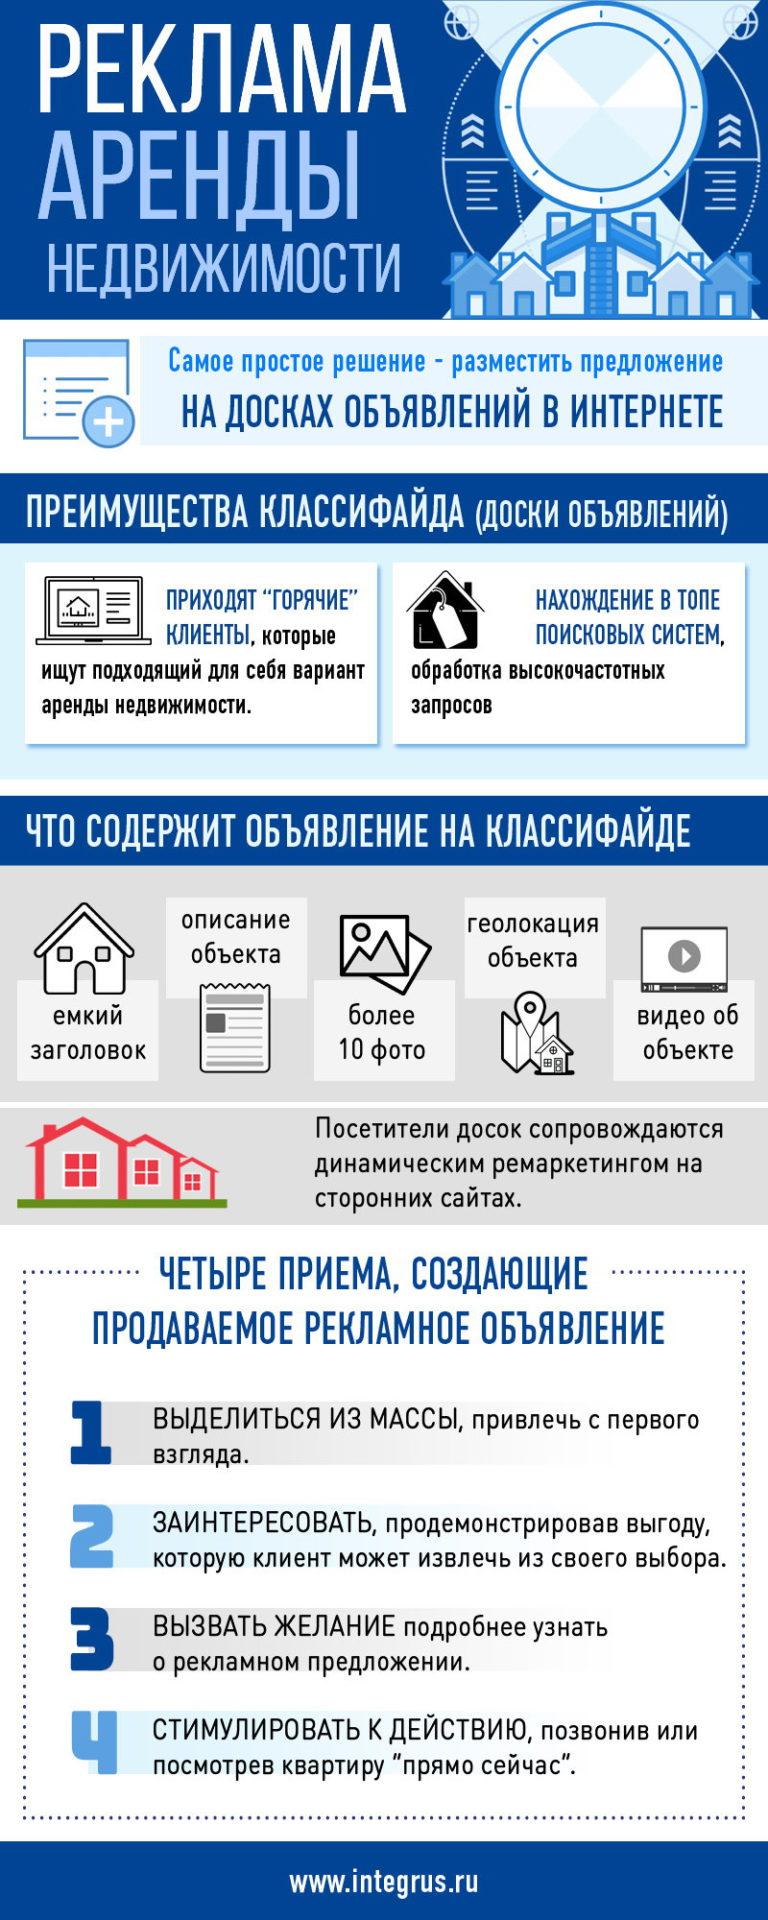 Продвижение услуг по аренде недвижимости